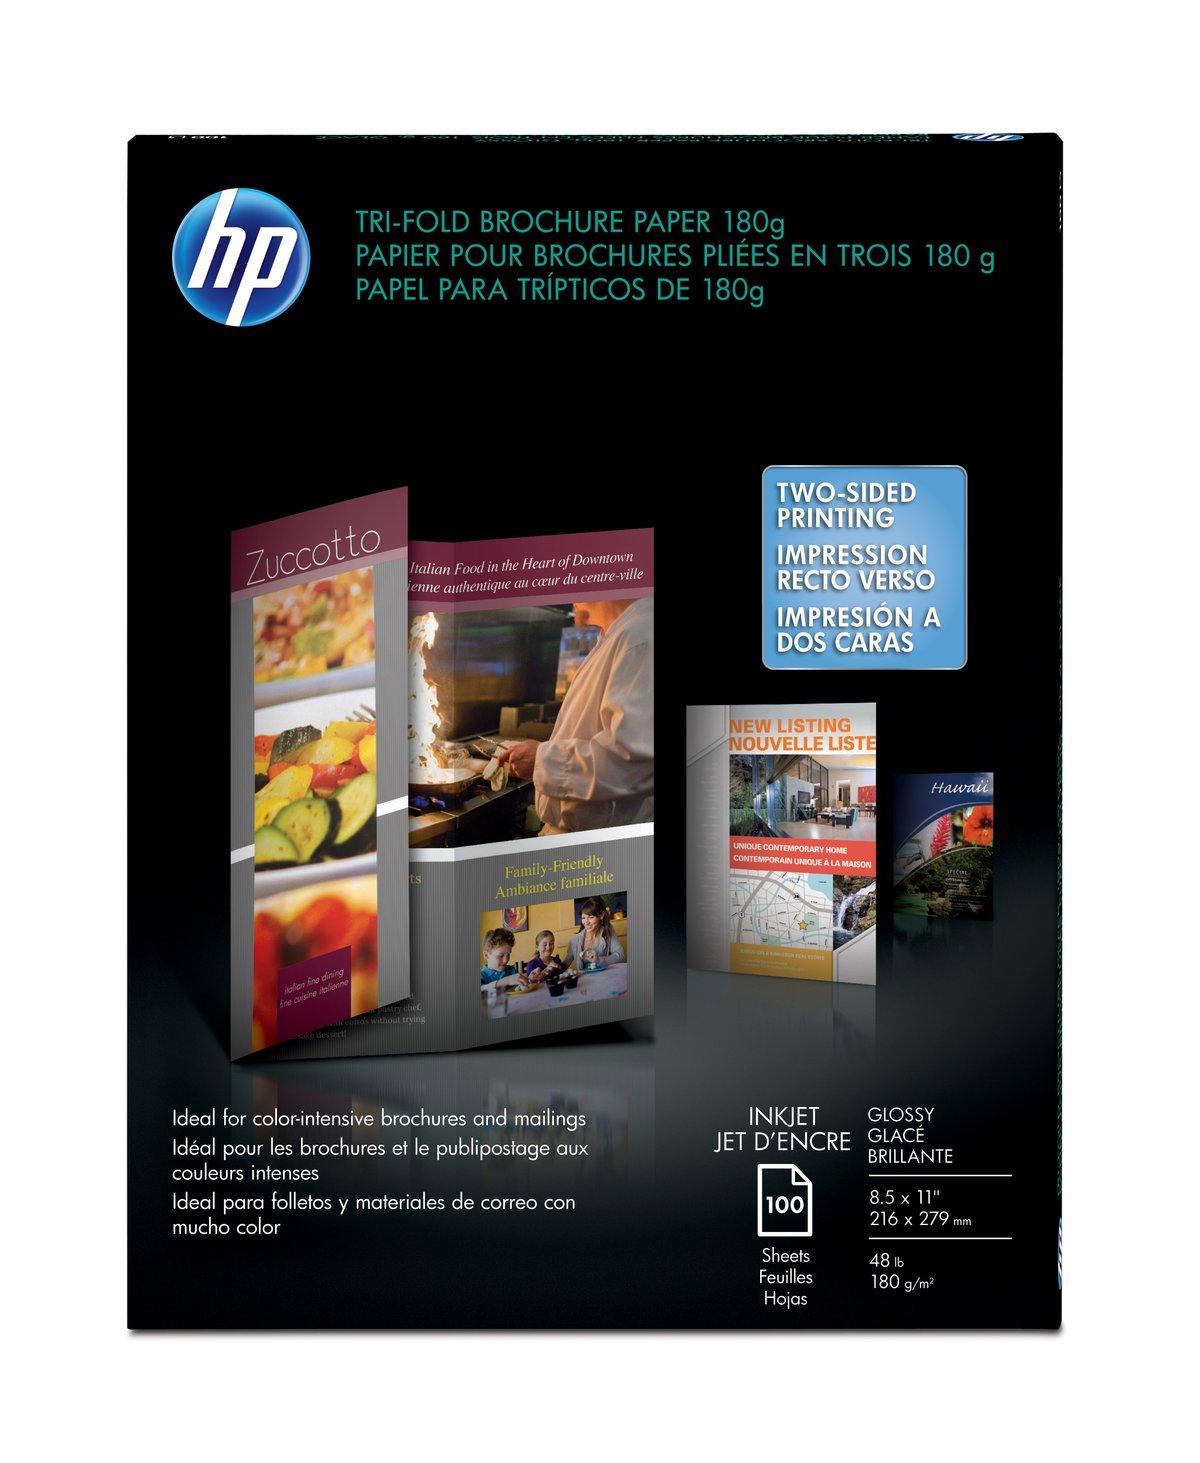 slide 1 of 1 show larger image hp inkjet glossy tri fold brochure